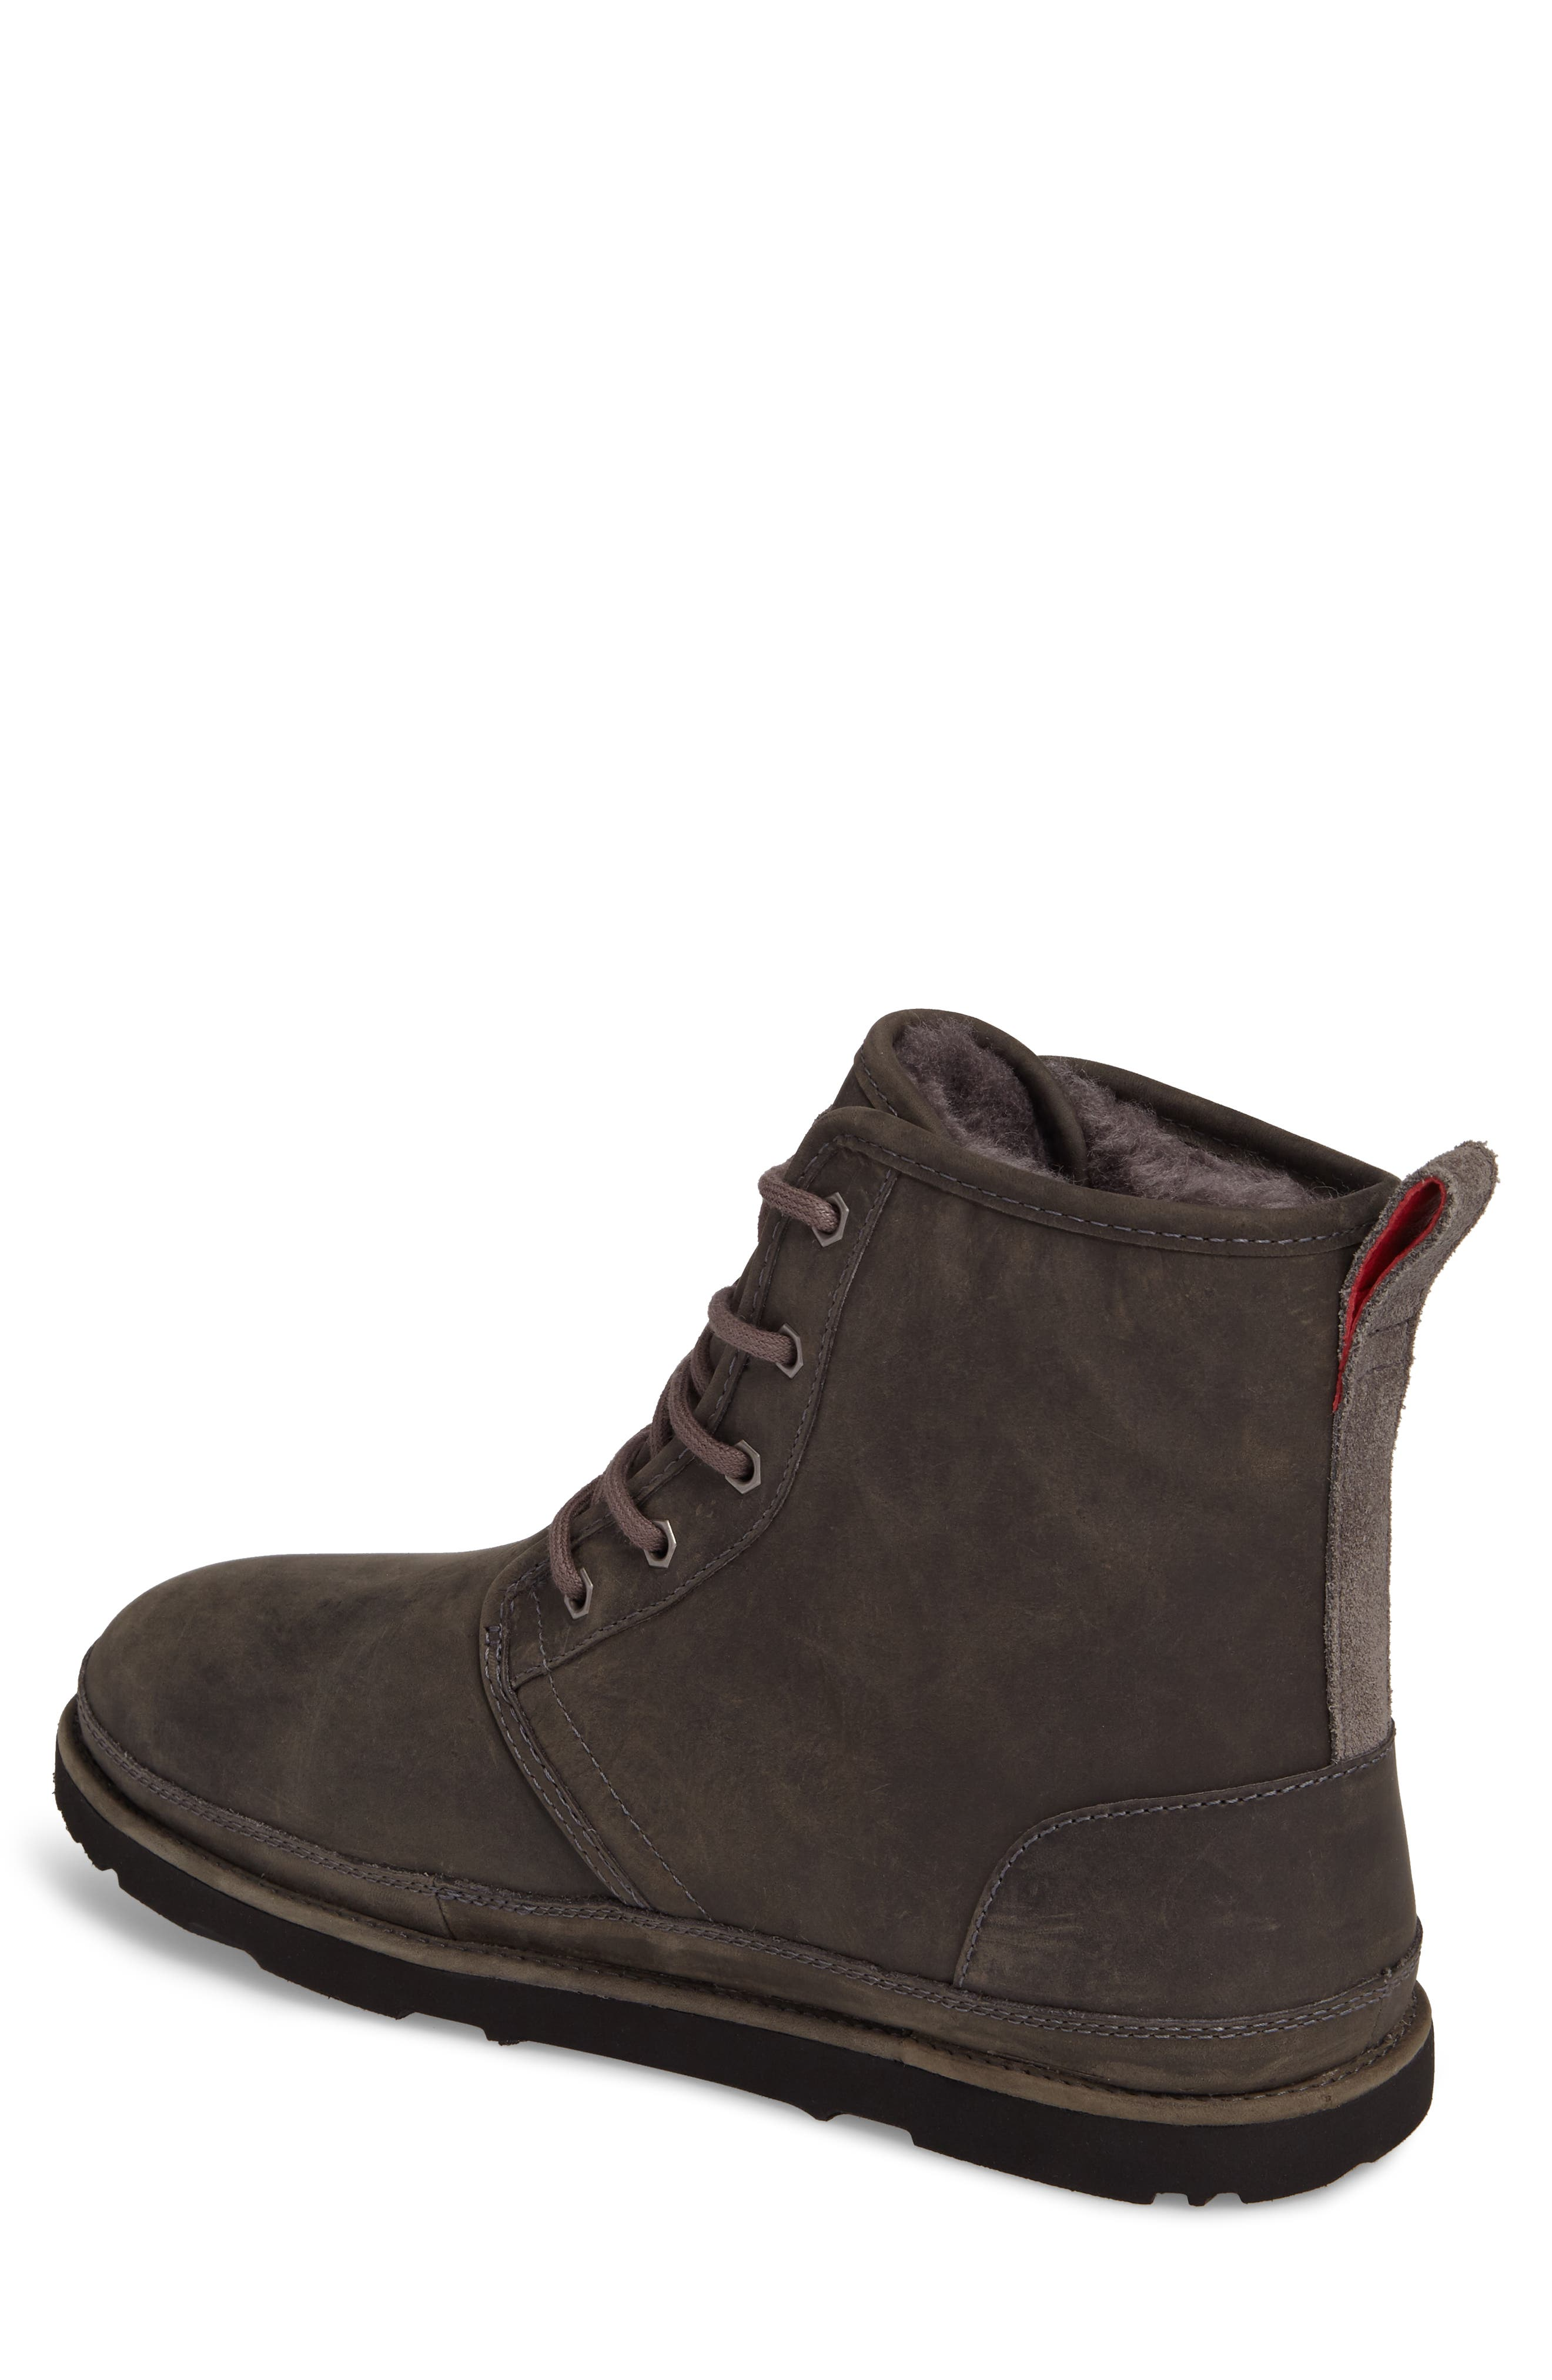 Harkley Plain Toe Boot,                             Alternate thumbnail 2, color,                             CHARCOAL